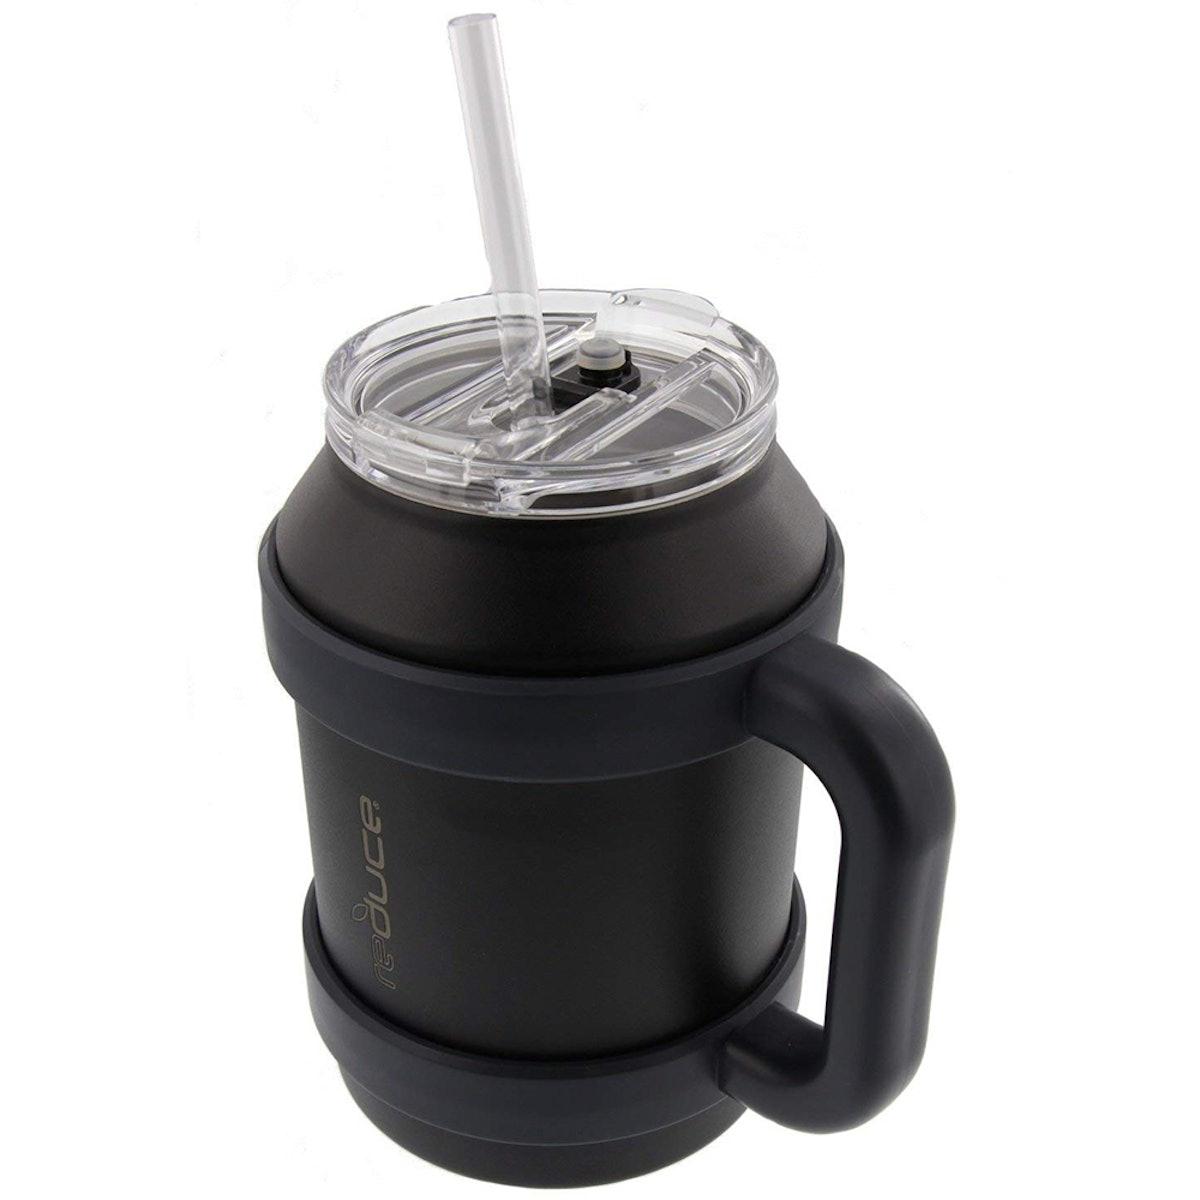 Reduce Stainless Steel Thermal Coffee Mug, 50 oz